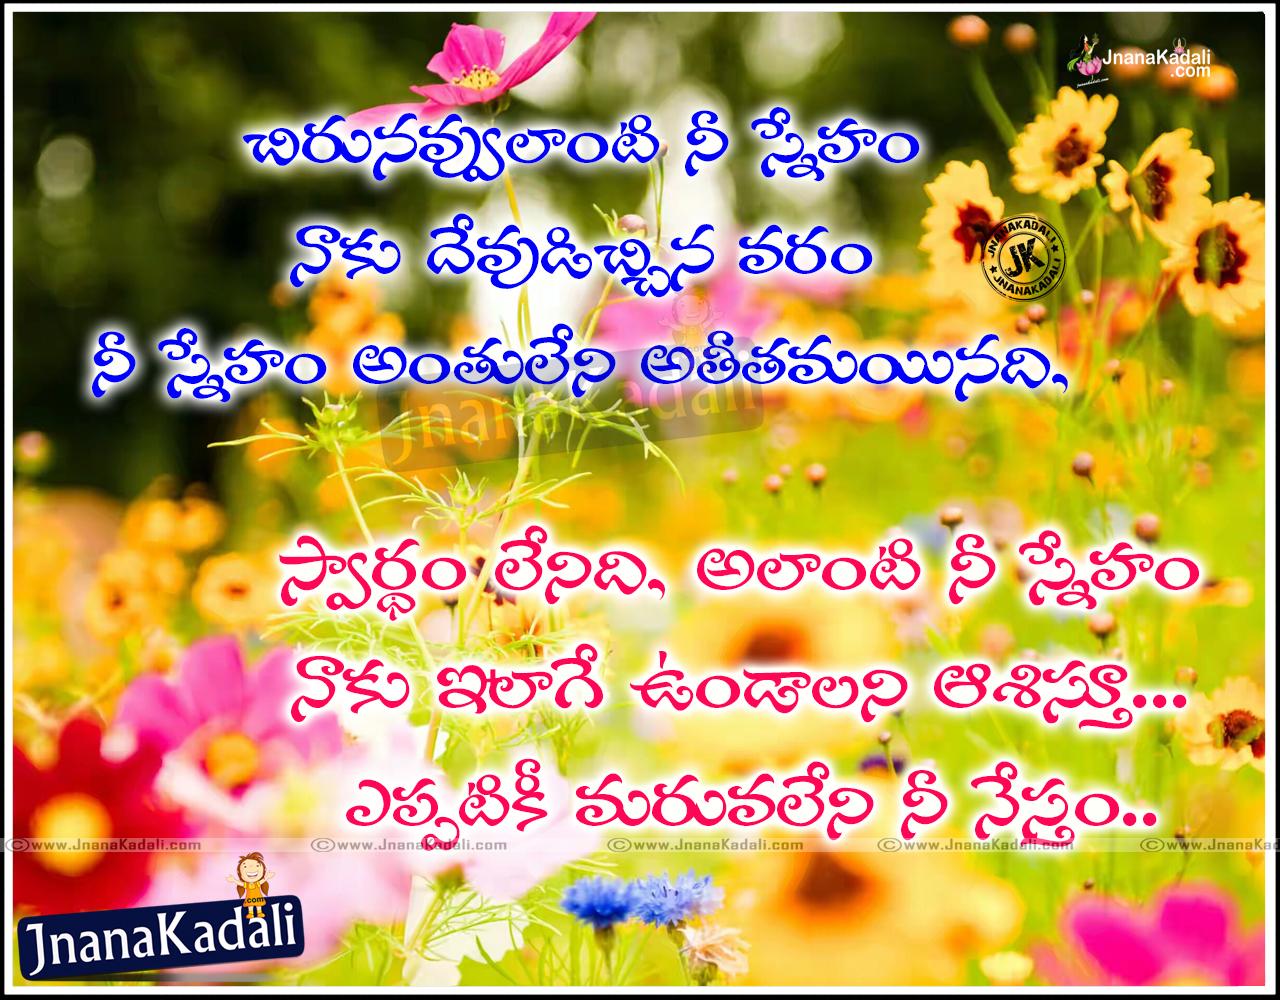 Friendship Quote Images In Telugu The Emoji